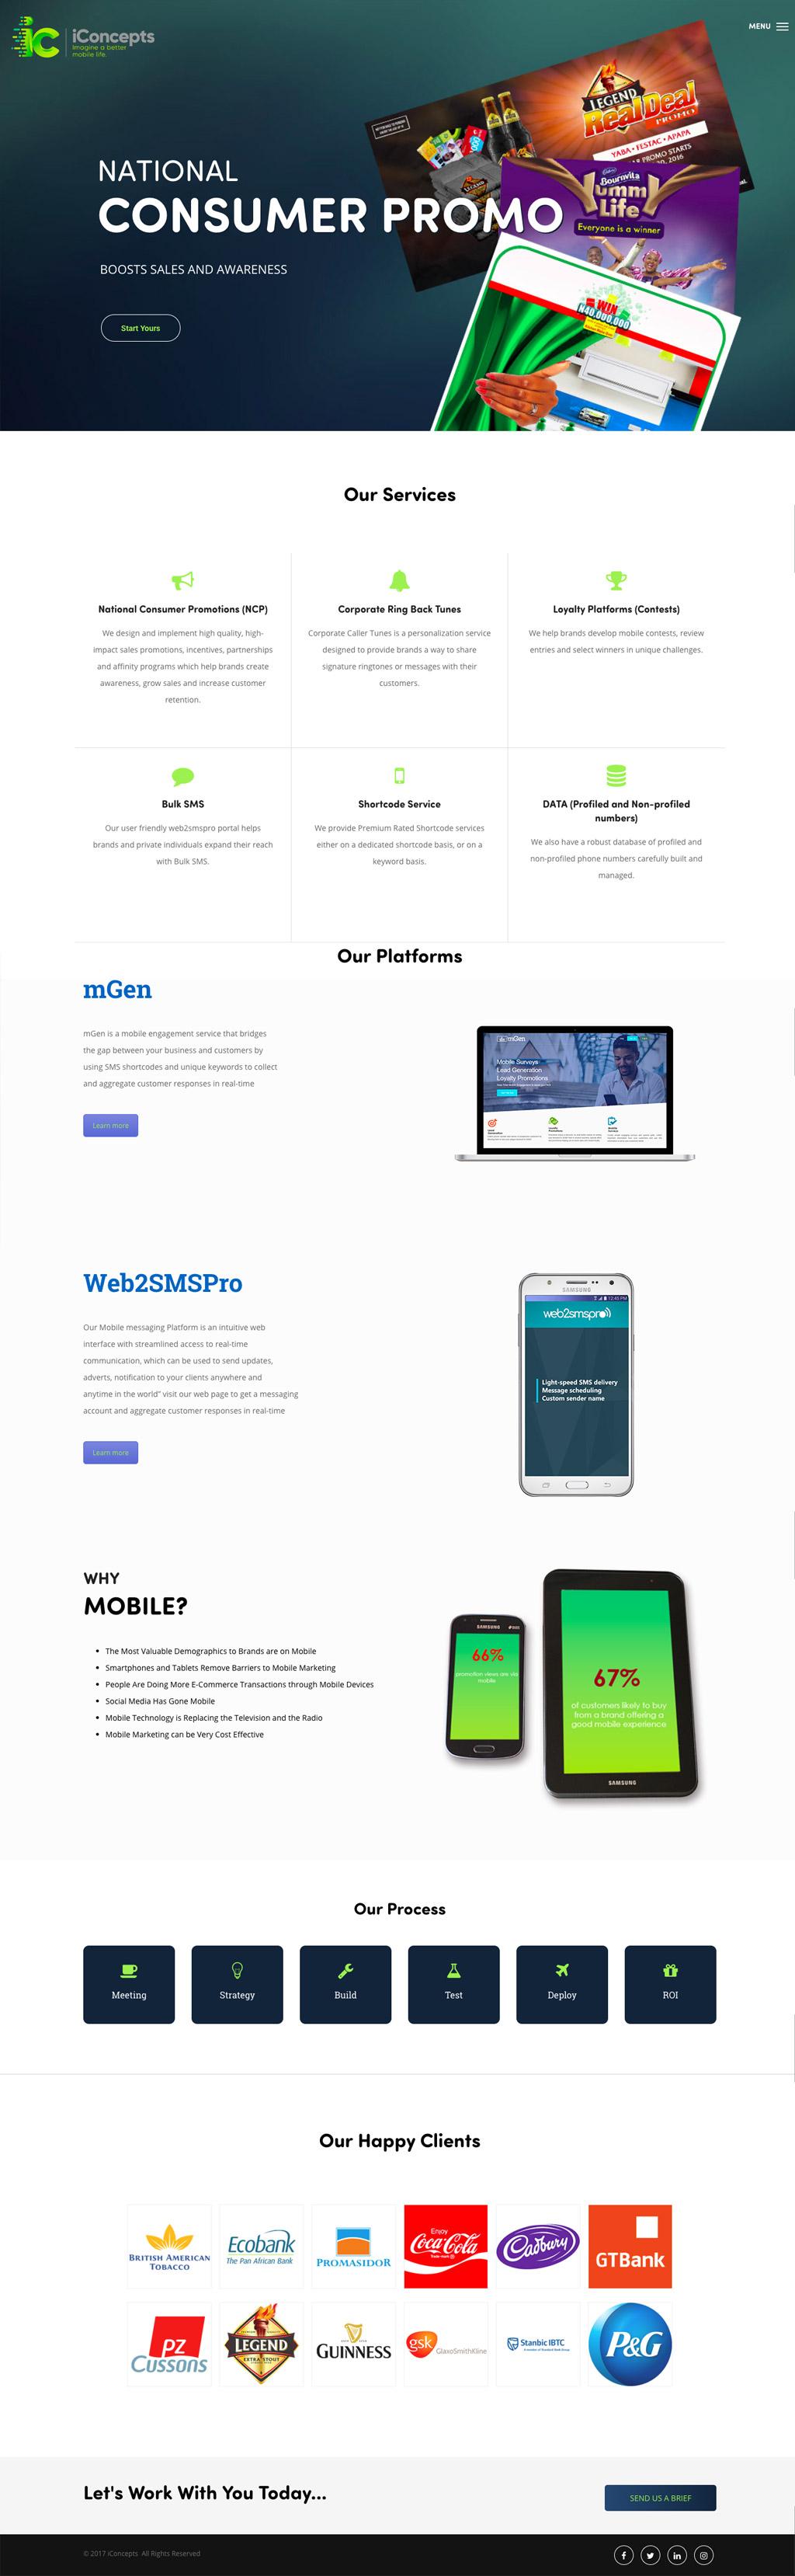 iConcepts website design 2